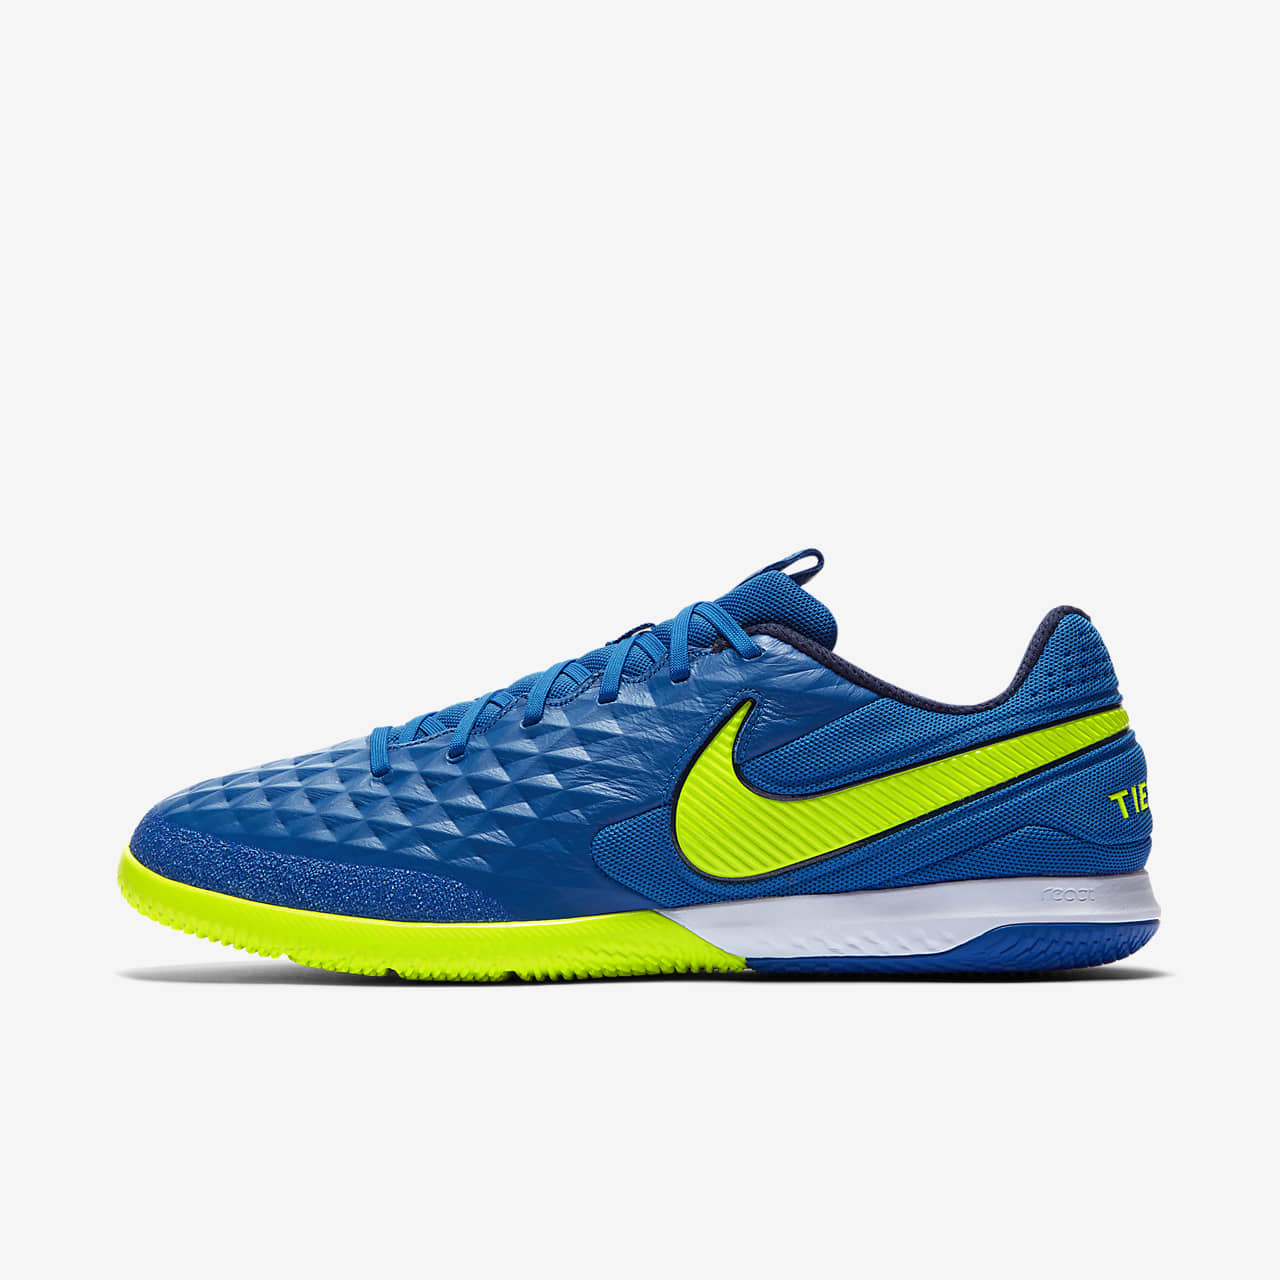 Fotbollssko för inomhusplan/futsal/street Nike React Tiempo Legend 8 Pro IC